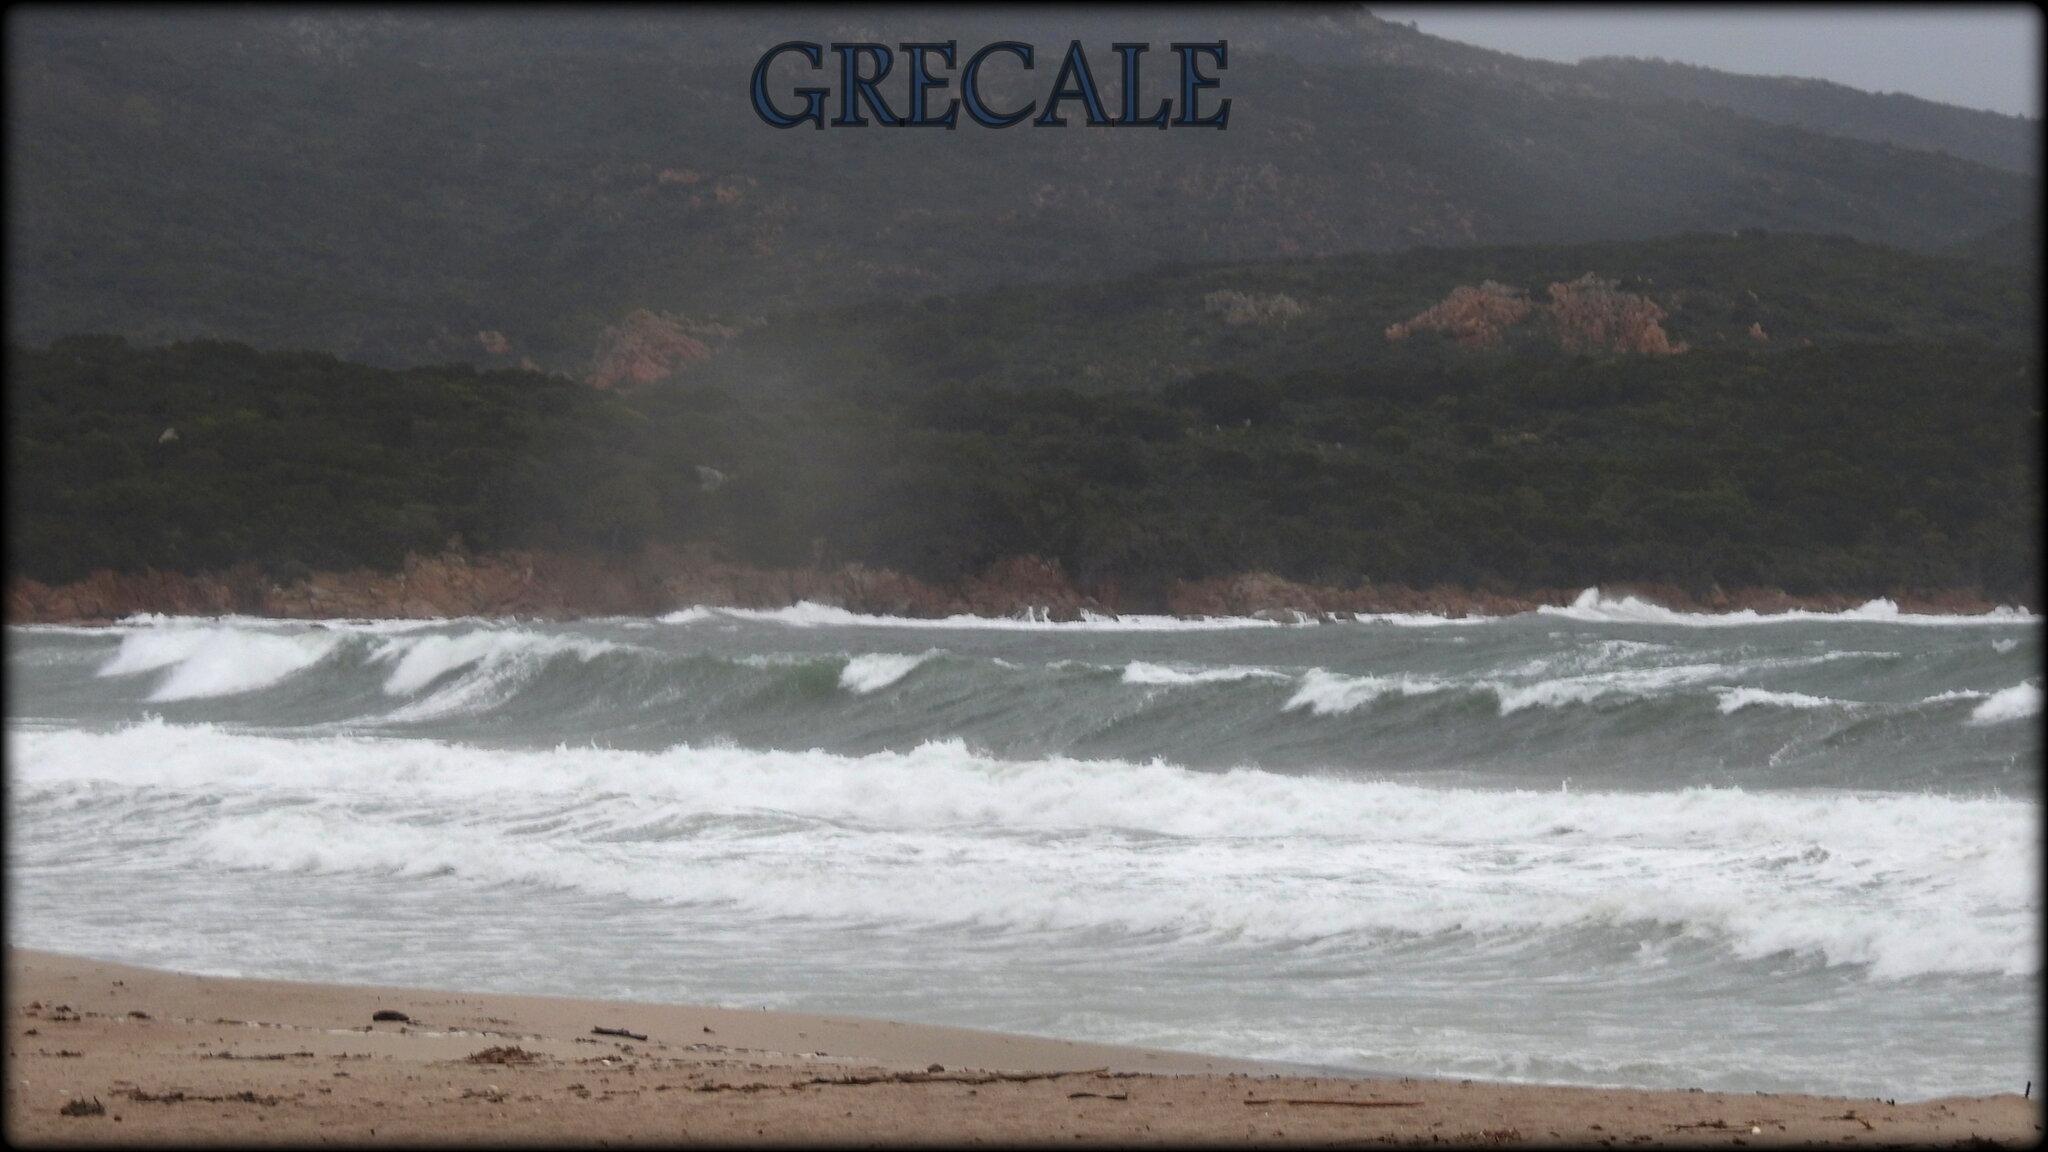 GRECALE___CORSICA_ISLAND_